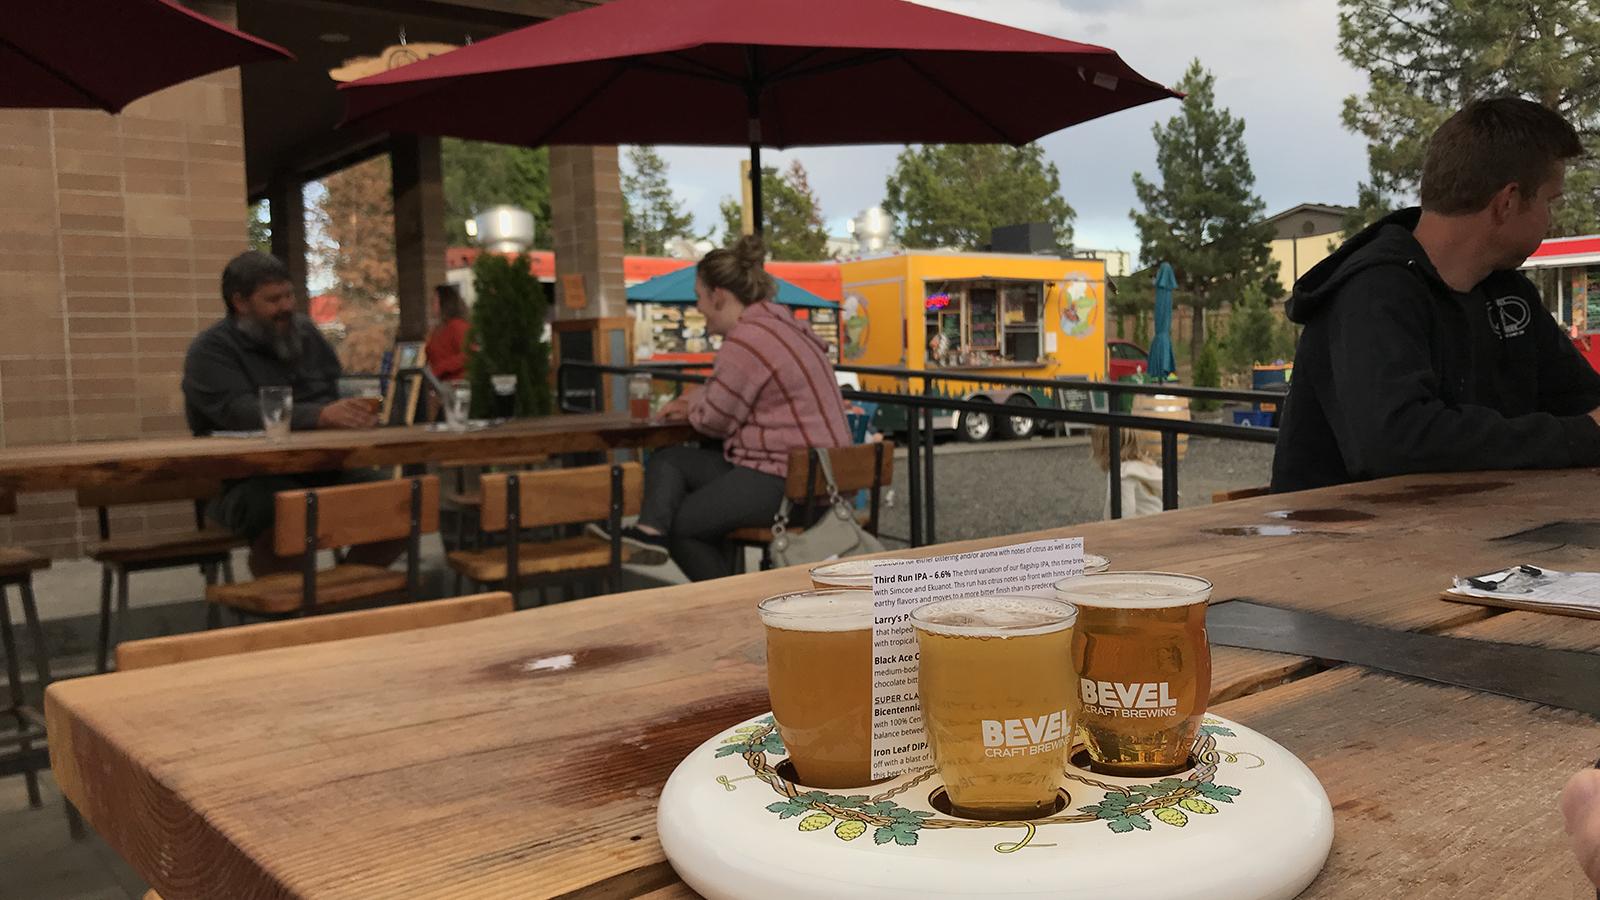 Bevel beer taster tray